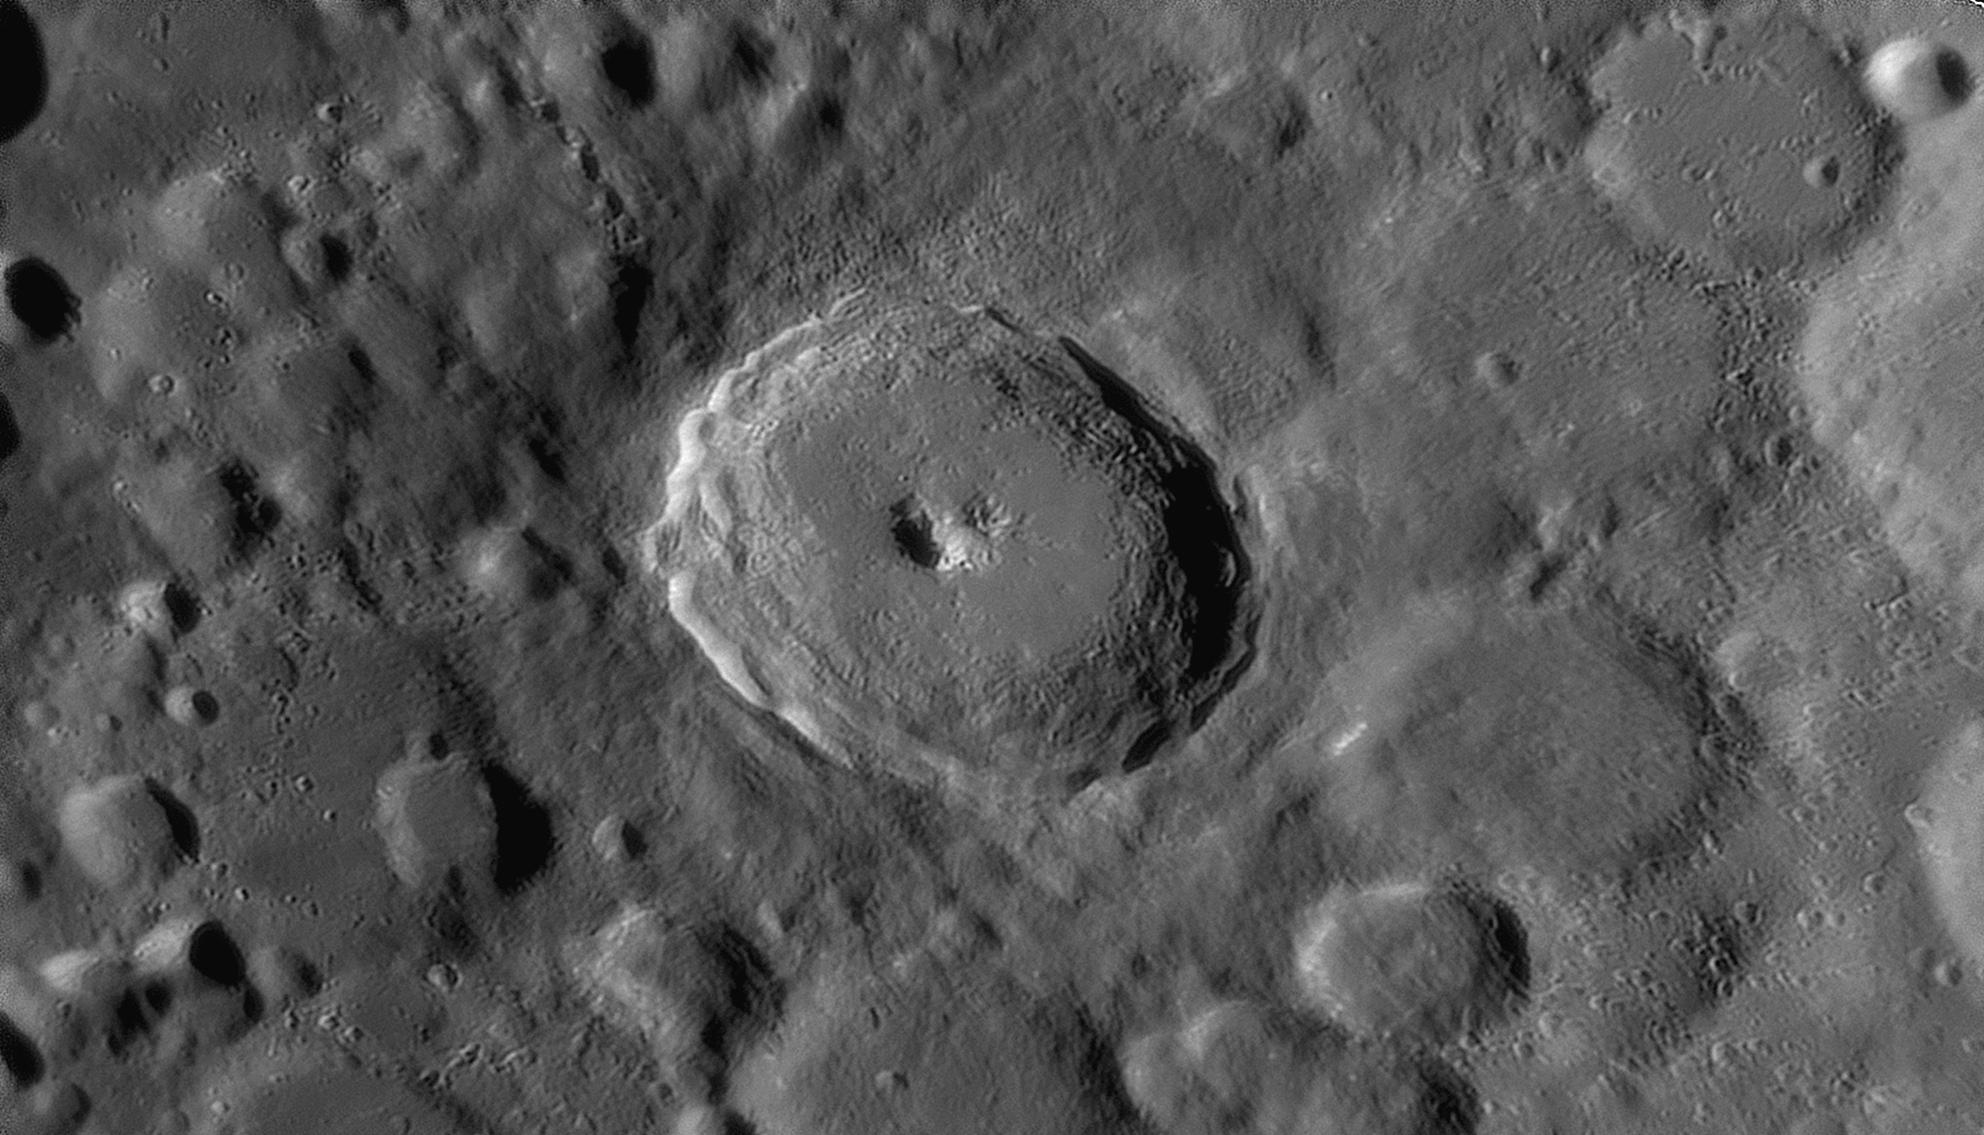 large.moon_CAS-03_04_2020_TYCHO.jpg.a34e223ff235d0ad1006f3eab369afbe.jpg